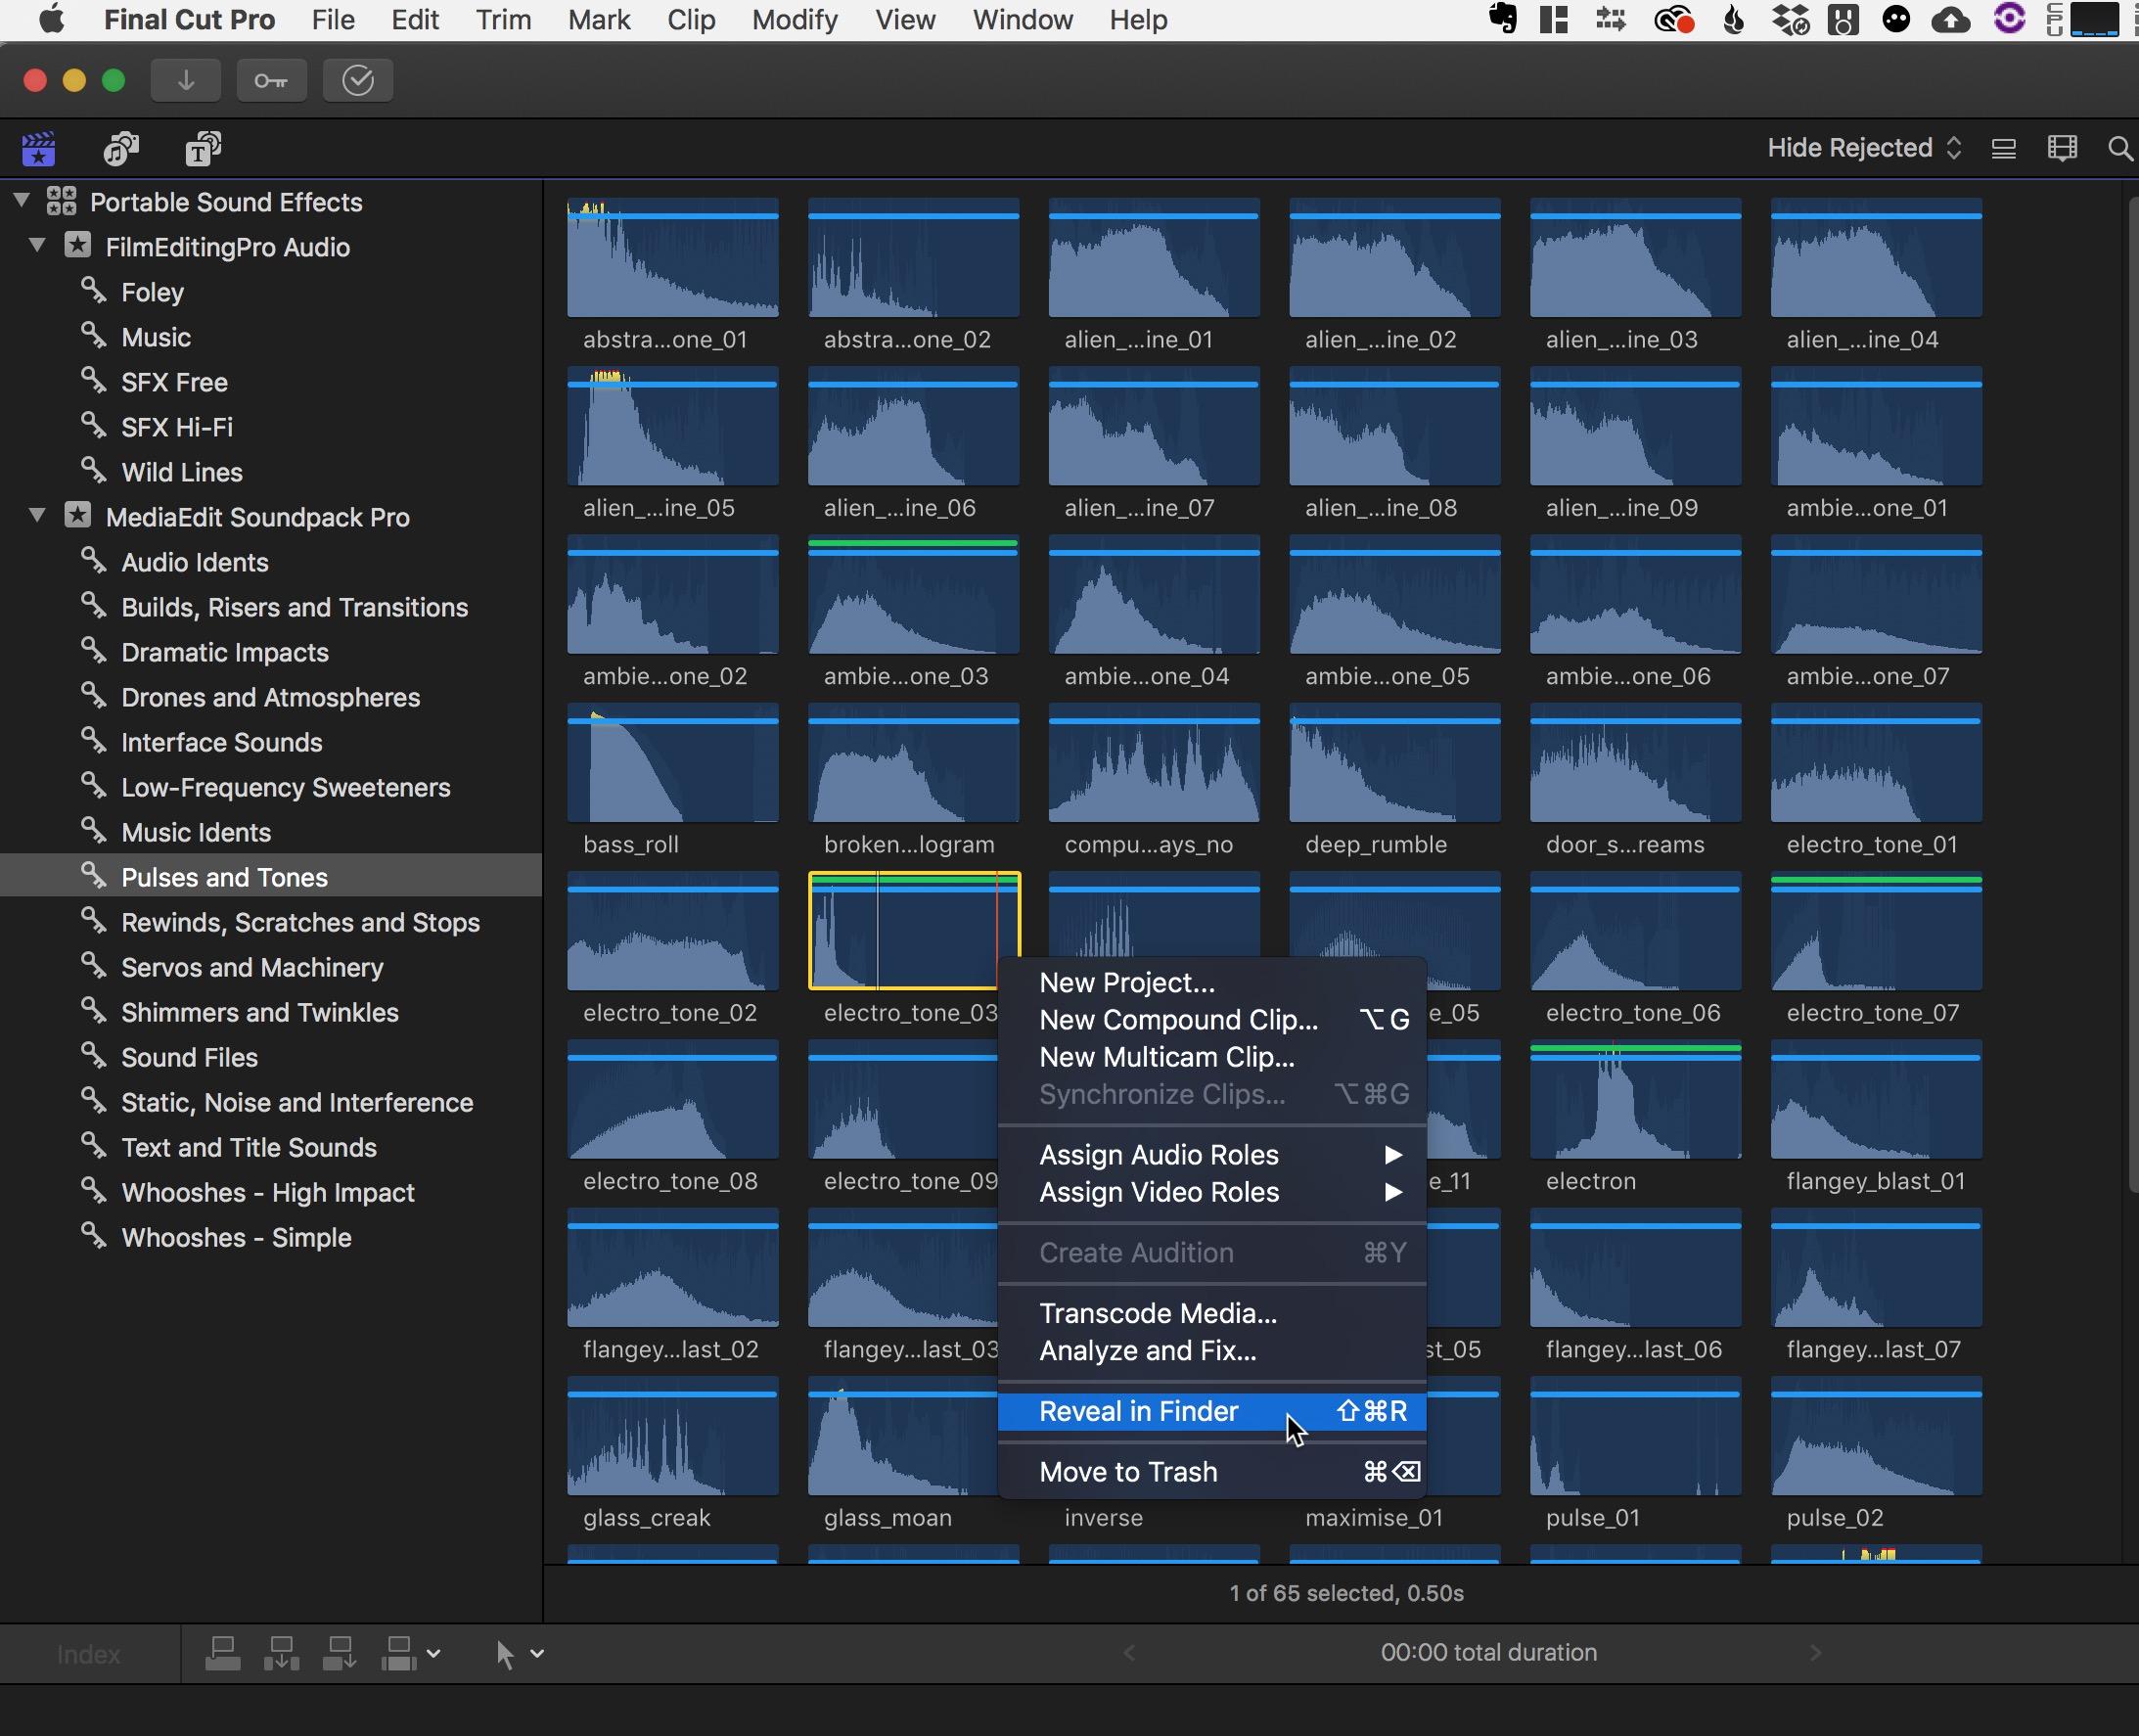 Final Cut Pro X browse sound effects